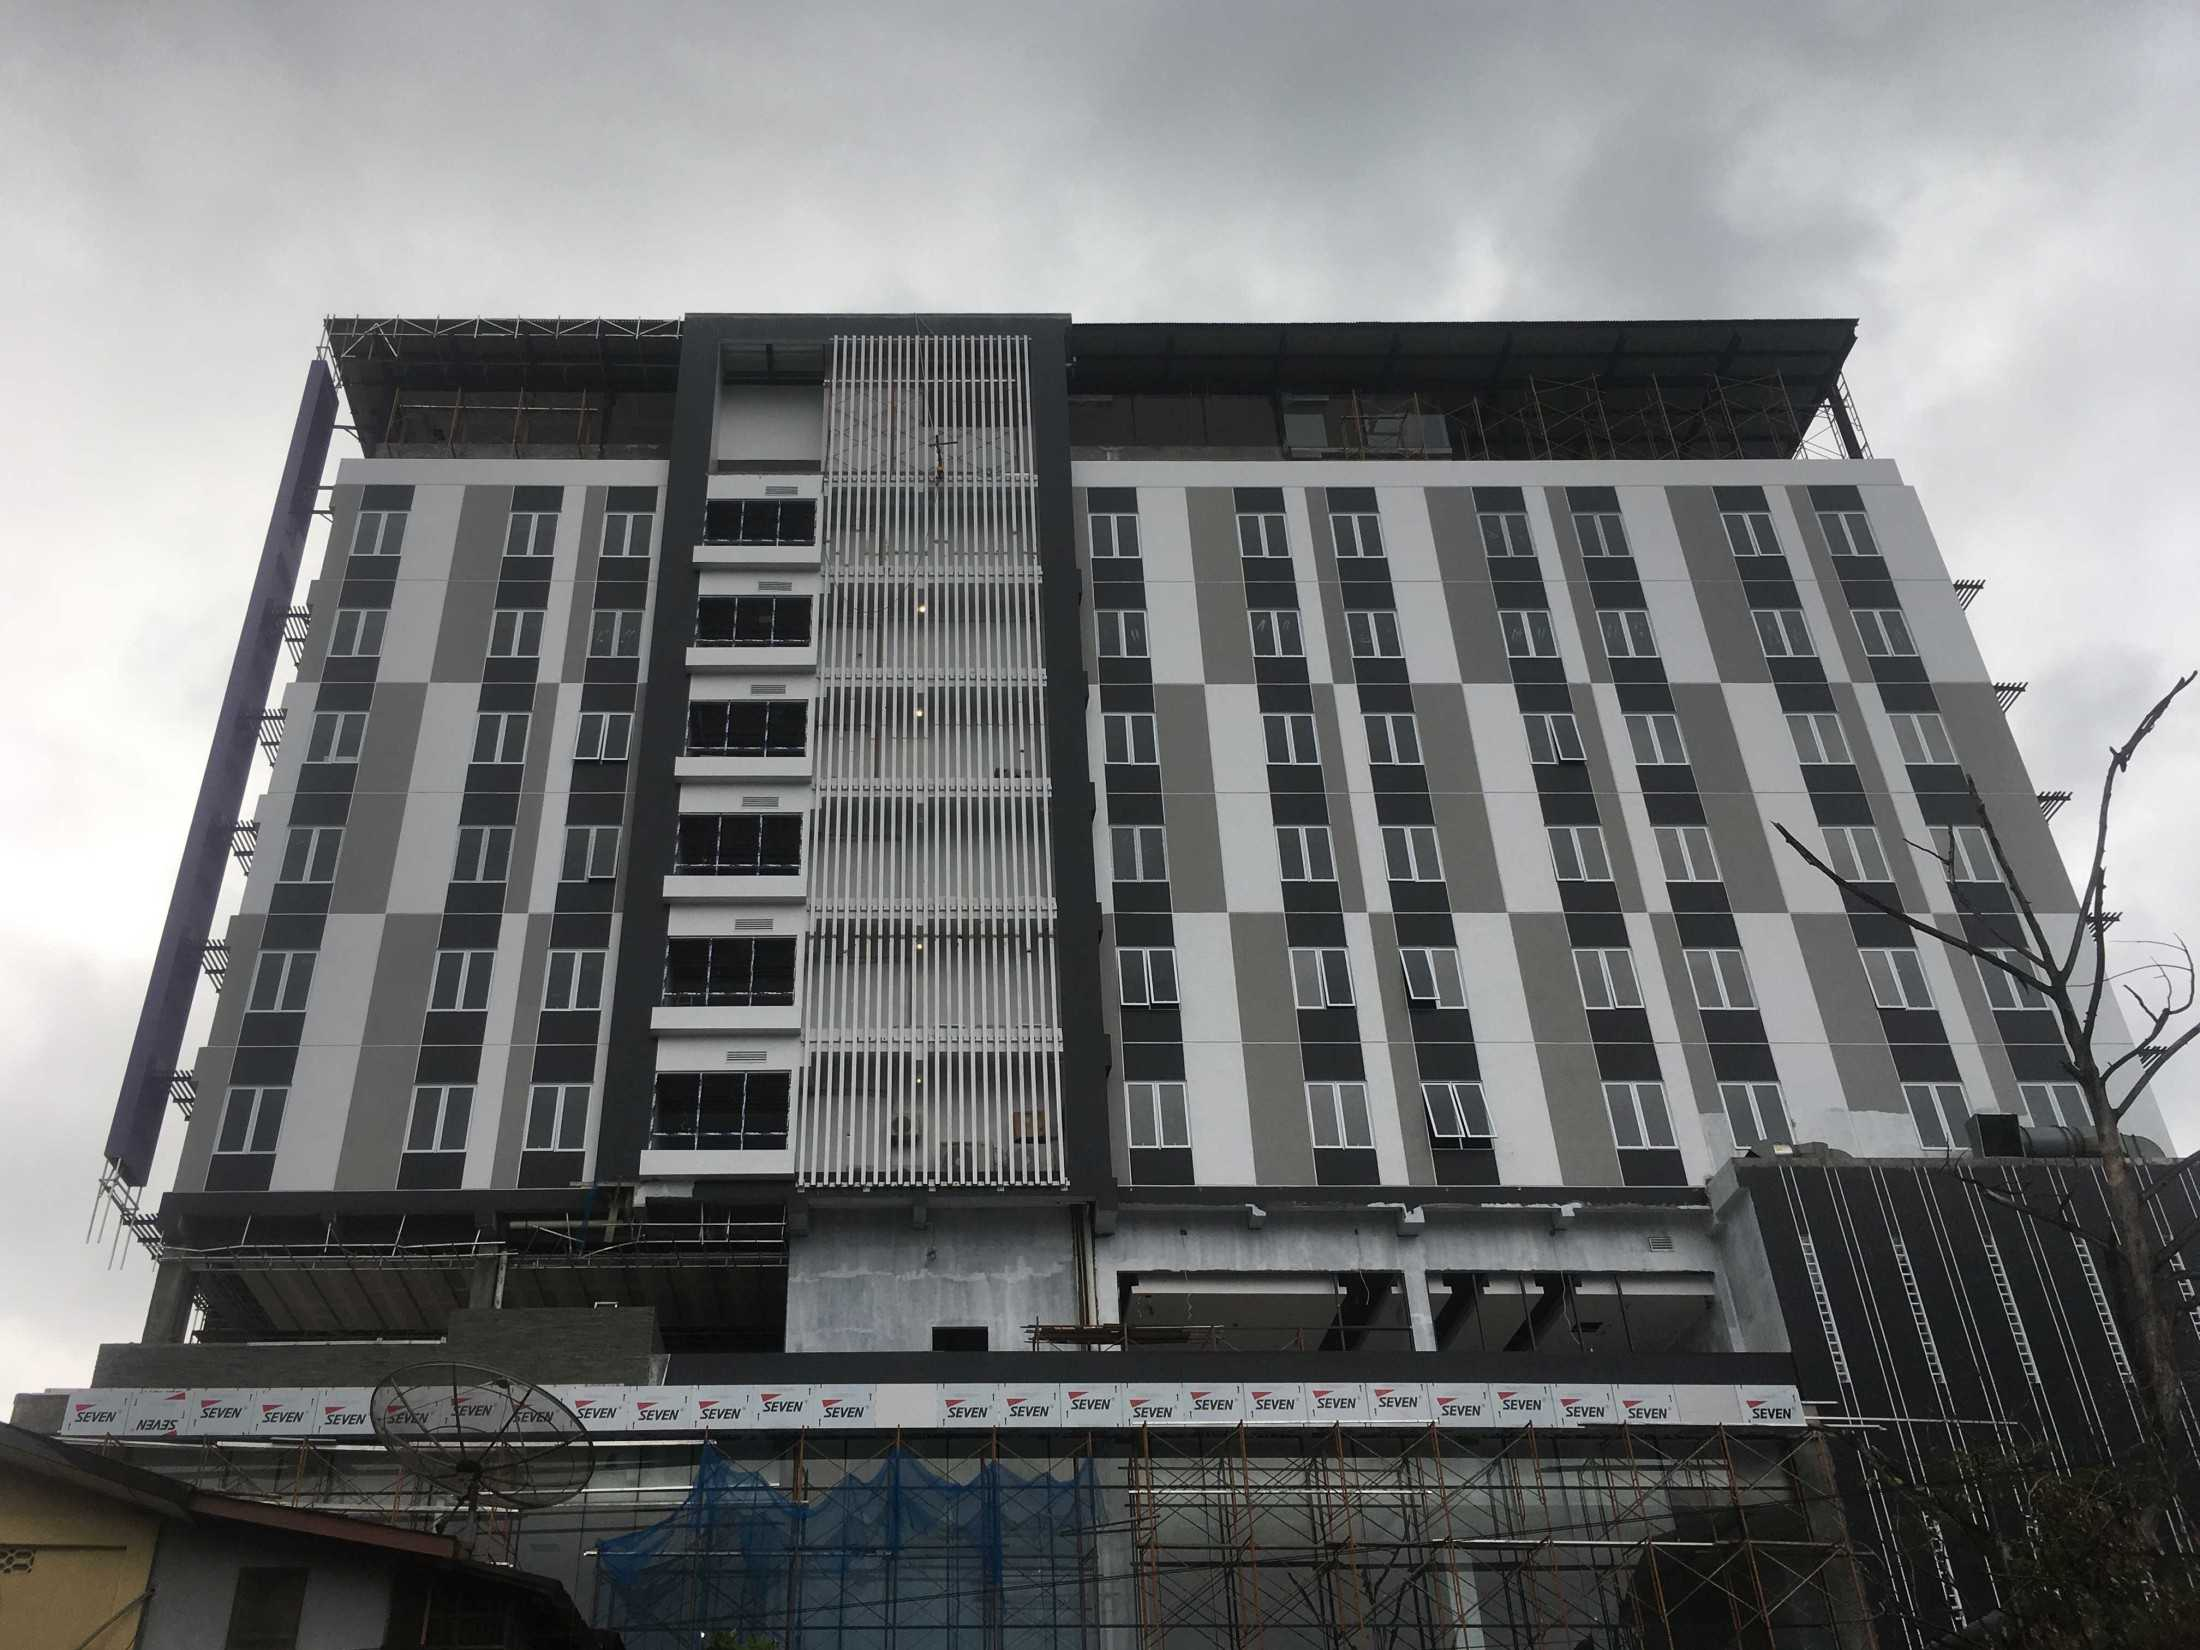 Pt.  Atelier Una Indonesia Fox (Fame) Hotel Jayapura Jayapura, Kota Jayapura, Papua, Indonesia Jayapura, Kota Jayapura, Papua, Indonesia Pt-Atelier-Una-Indonesia-Fame-Hotel-Jayapura  73377